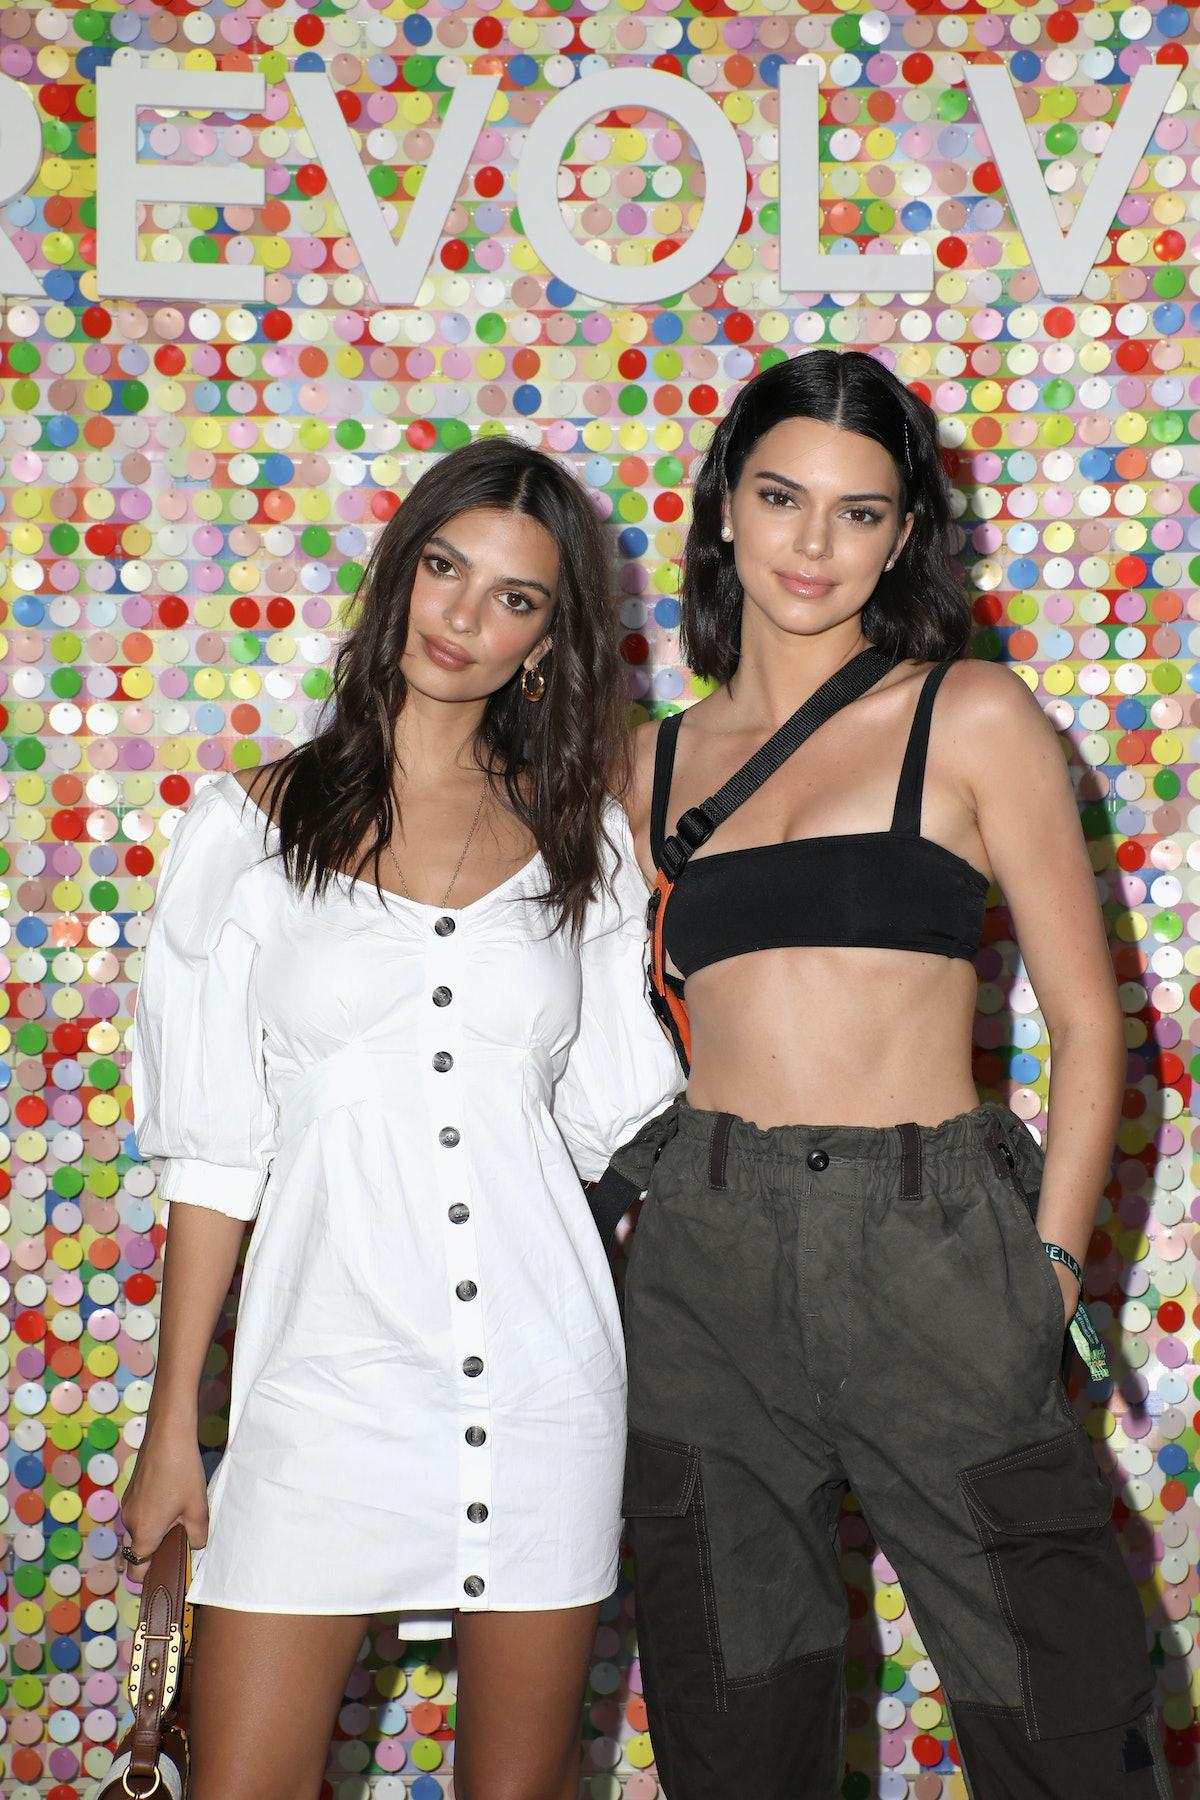 Emily Ratajkowski and Kendall Jenner look like twins.